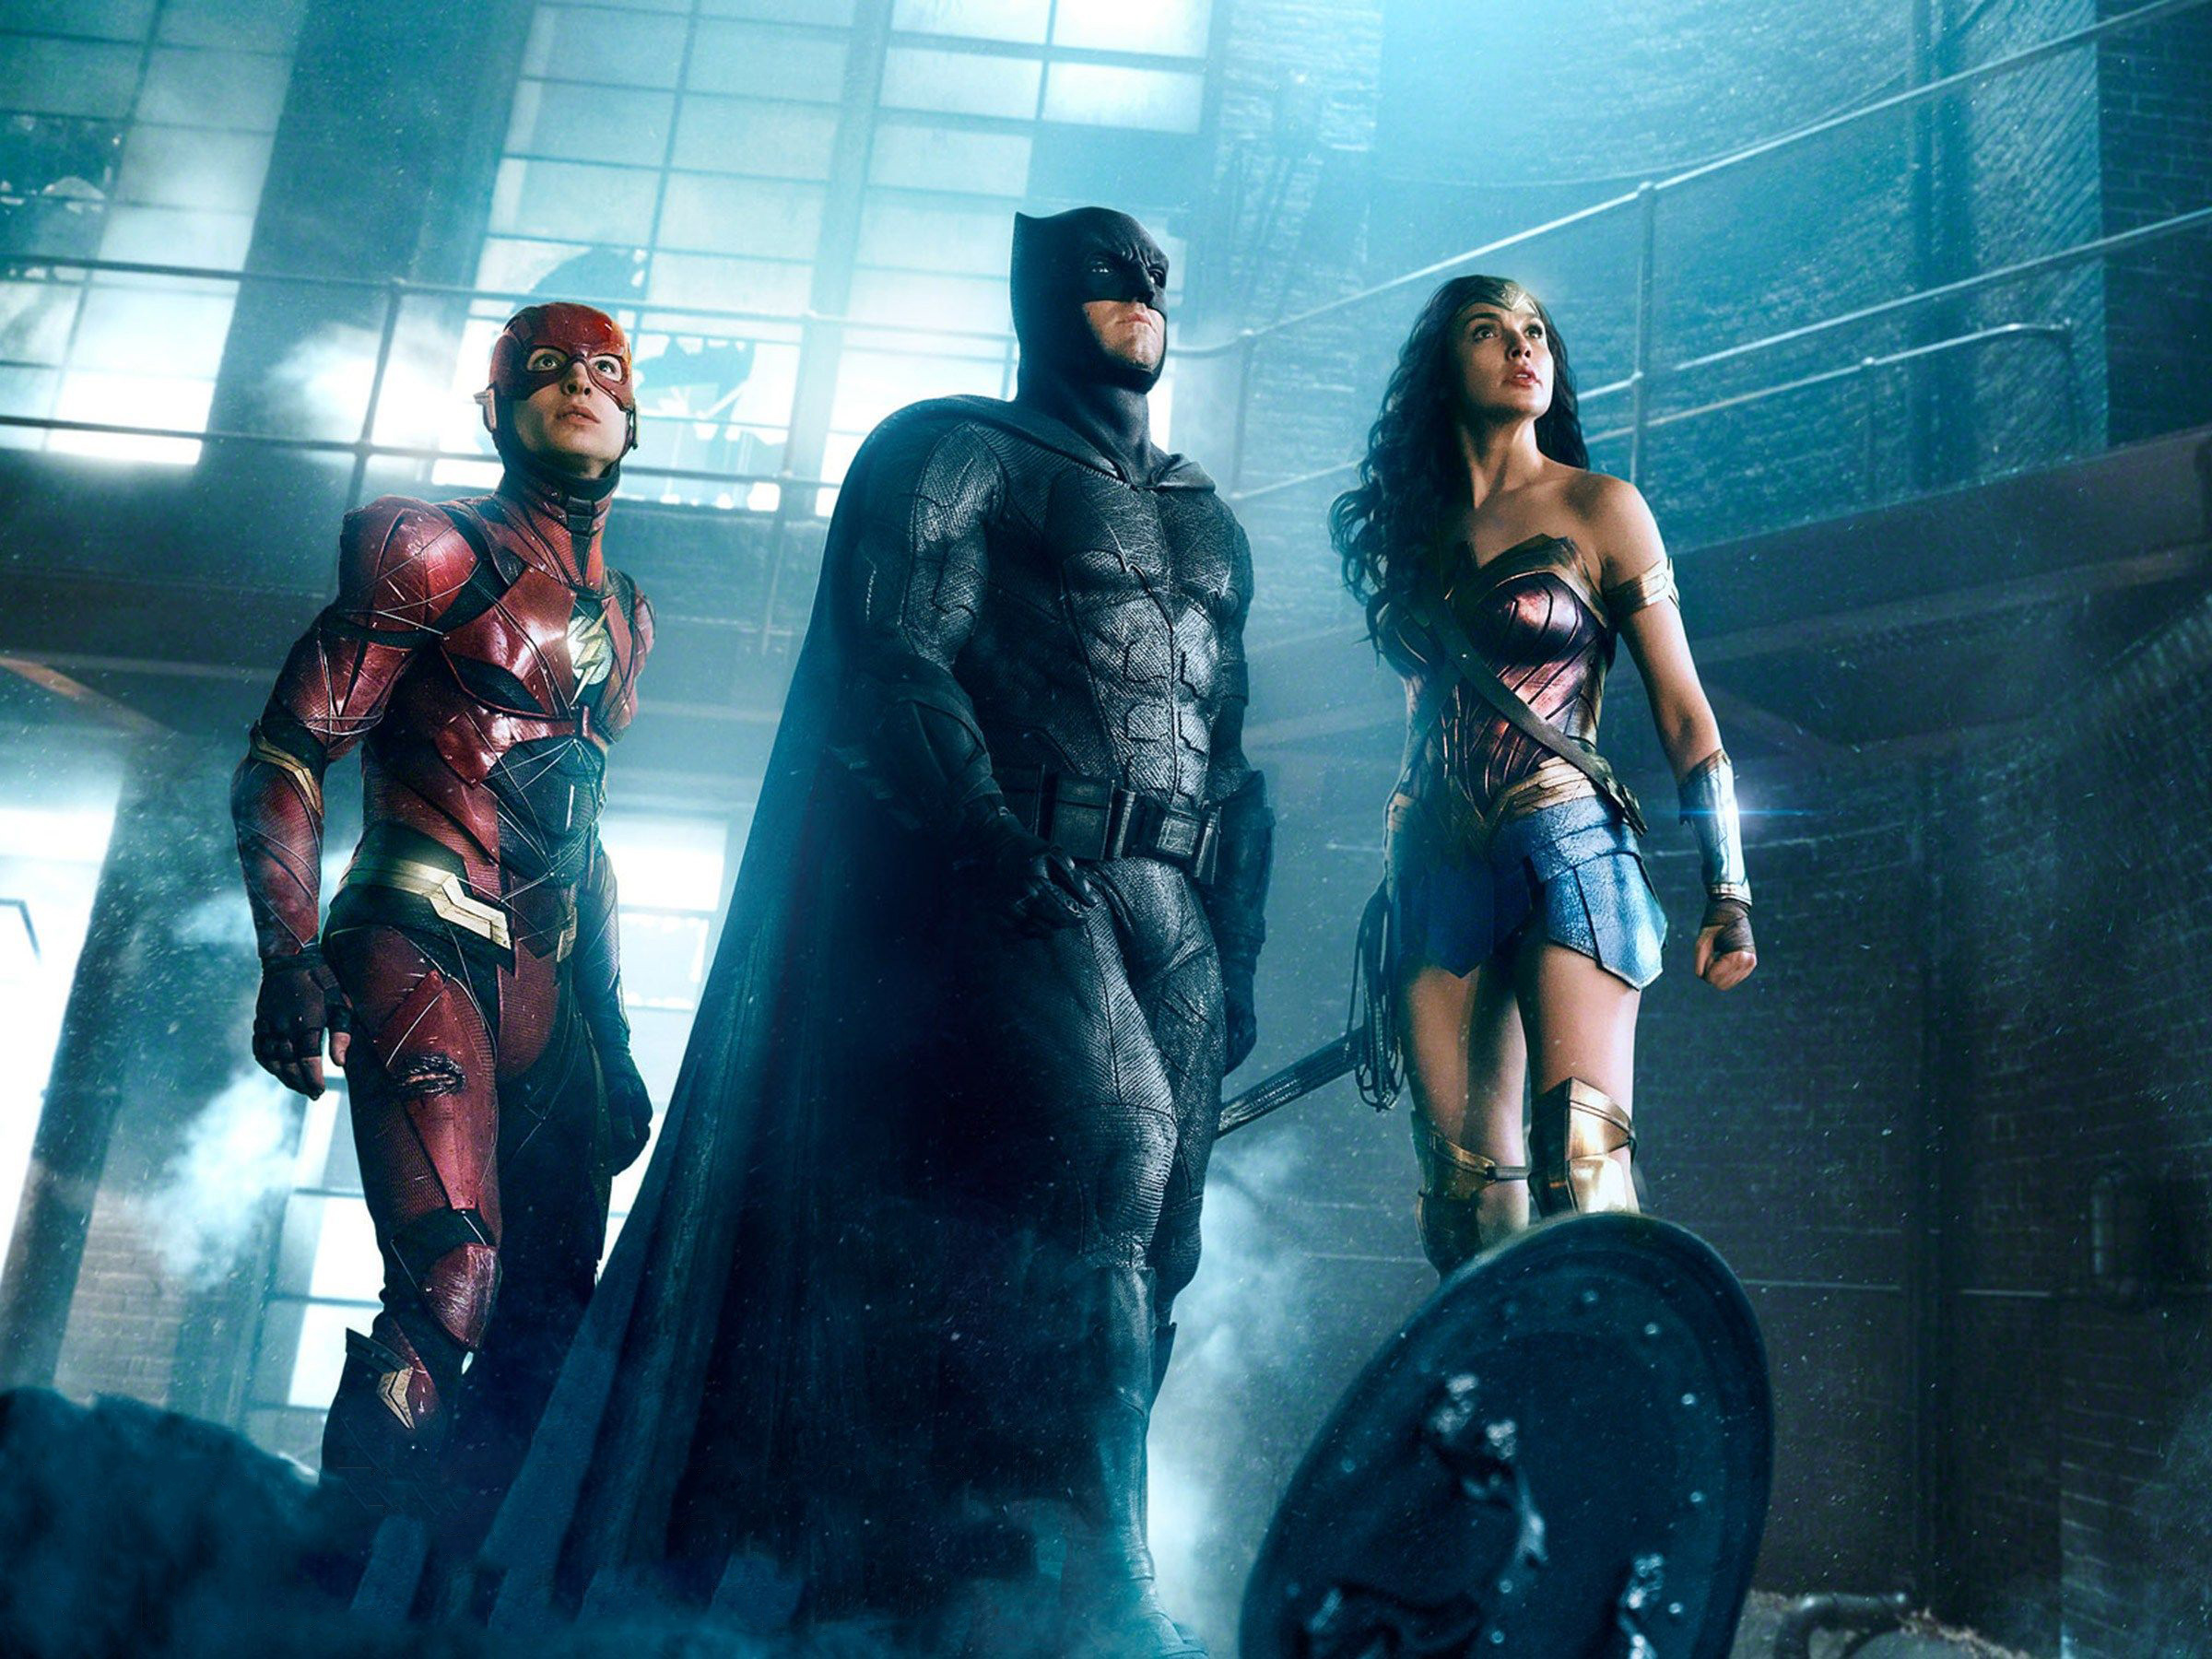 1280x1024 Wonder Woman Movie 1280x1024 Resolution Hd 4k: Justice League Batman Flash And Wonder Woman, HD Movies